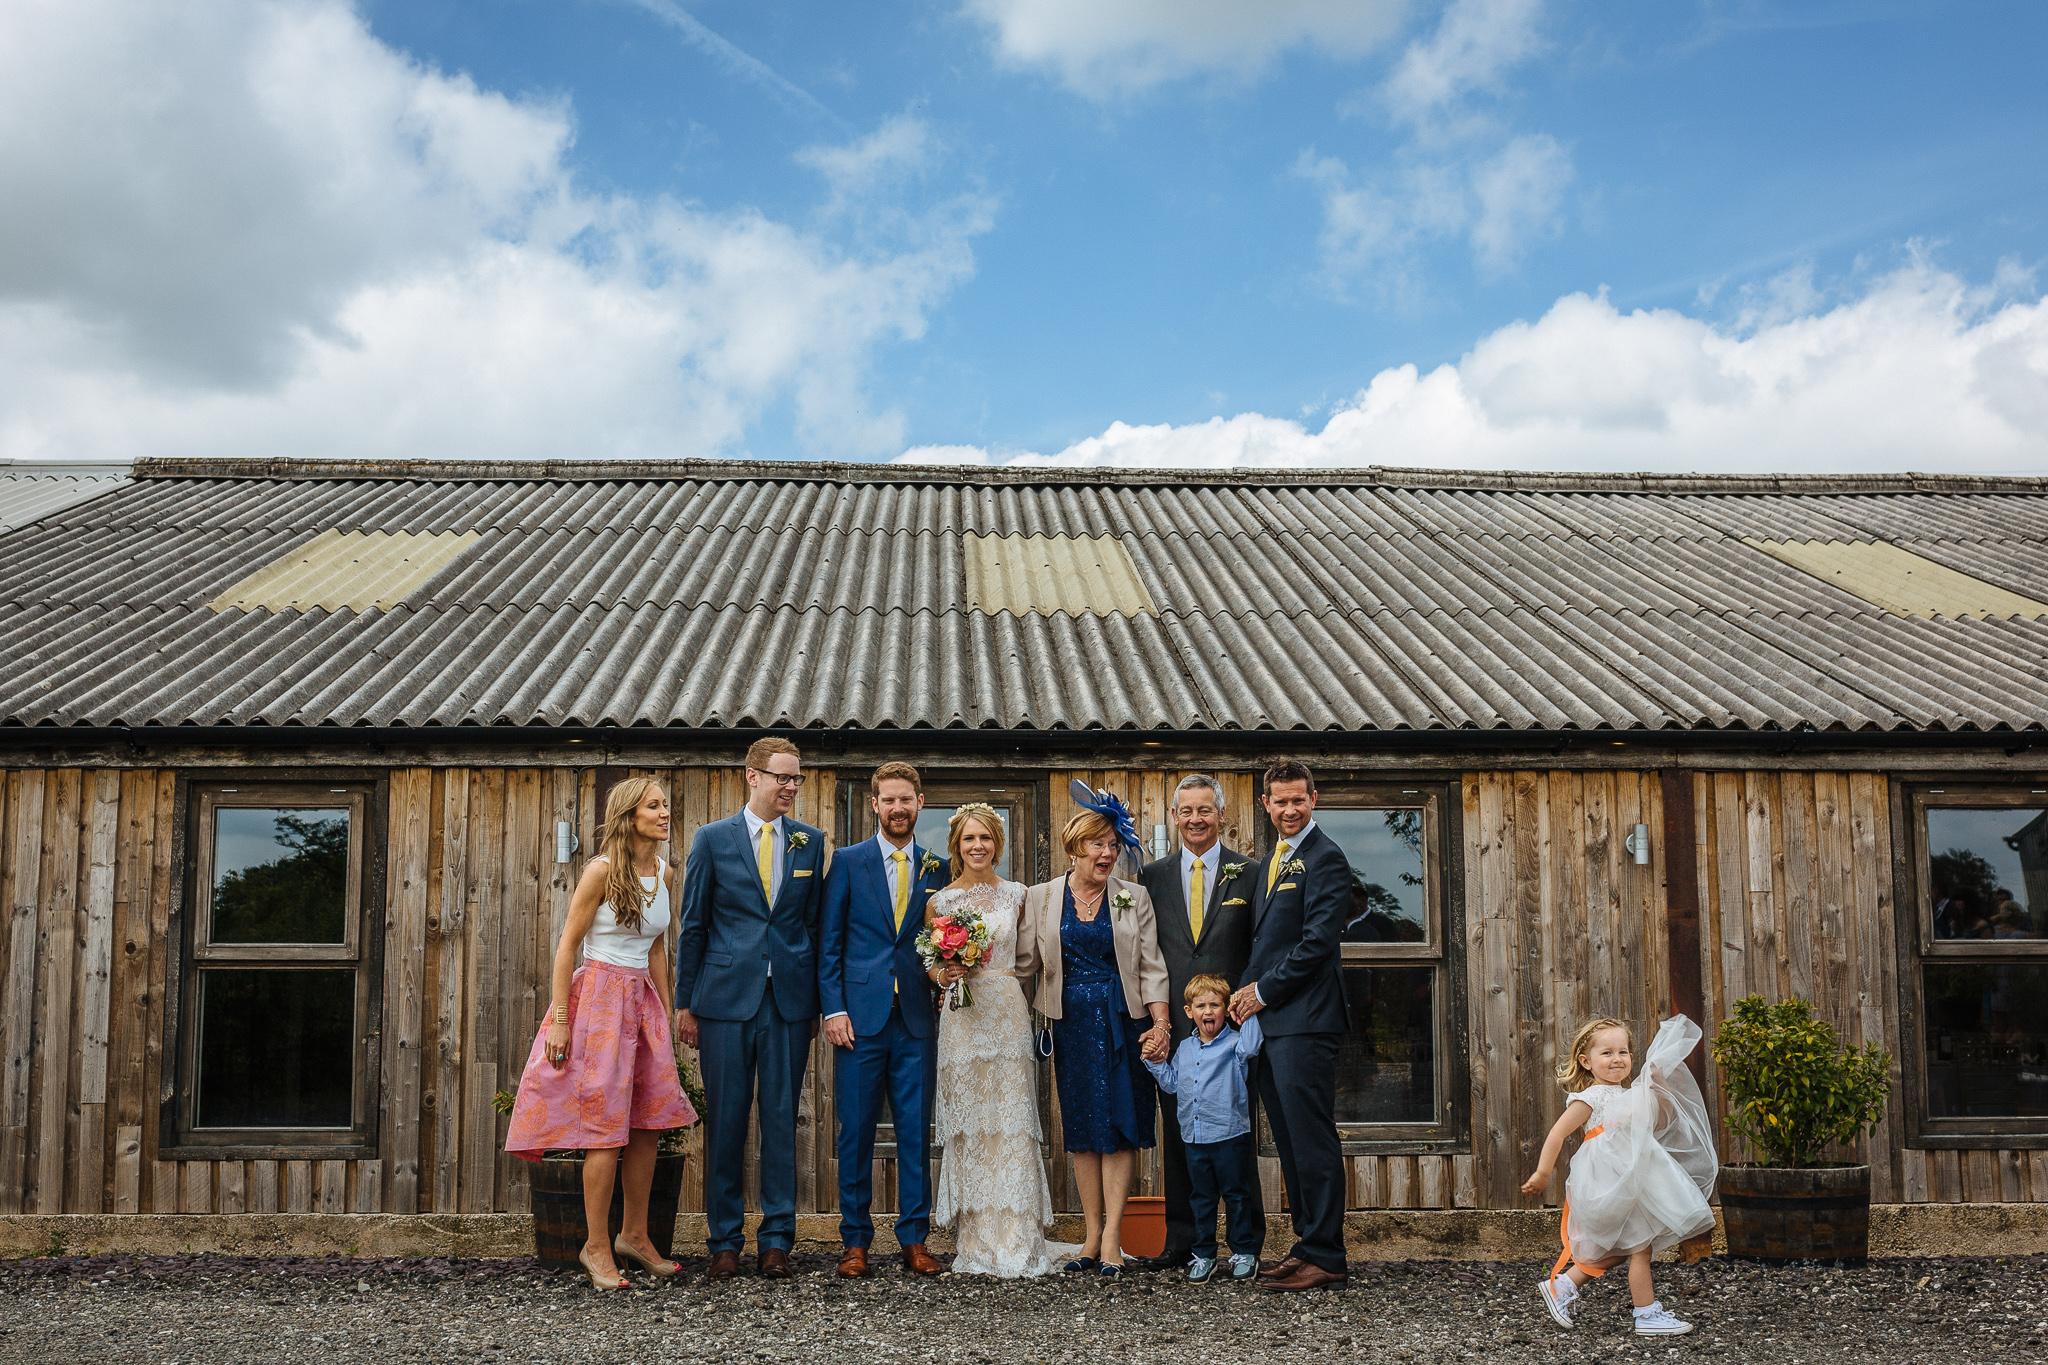 Owen-House-Barn-Wedding-Photographer-Cheshire-90059